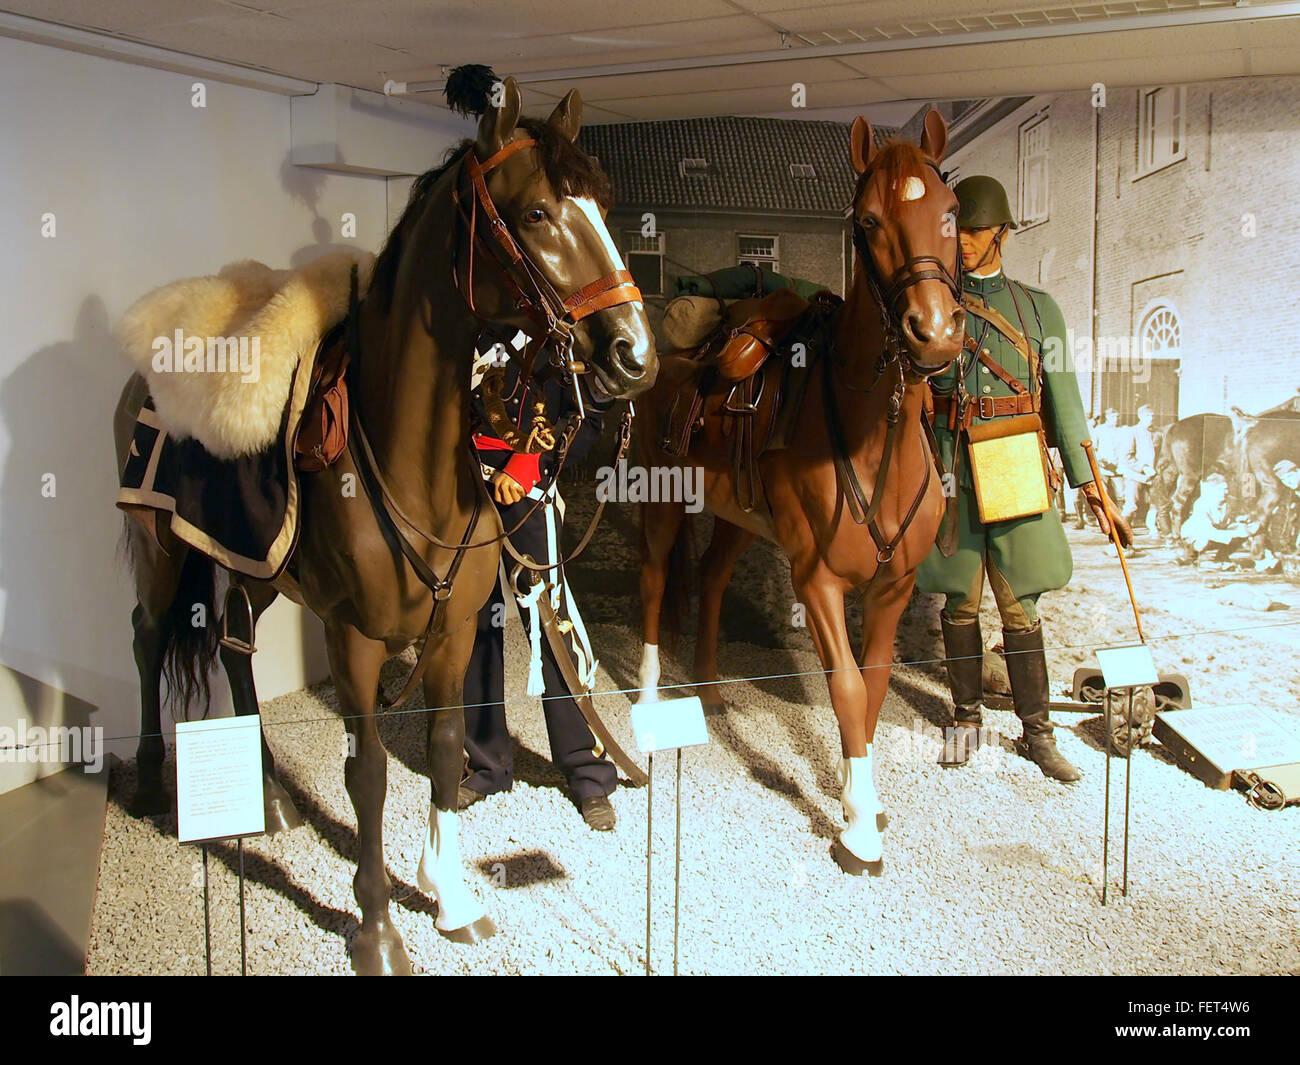 Dutch Cavalry Museum, Bernhardkazerne pic3 - Stock Image